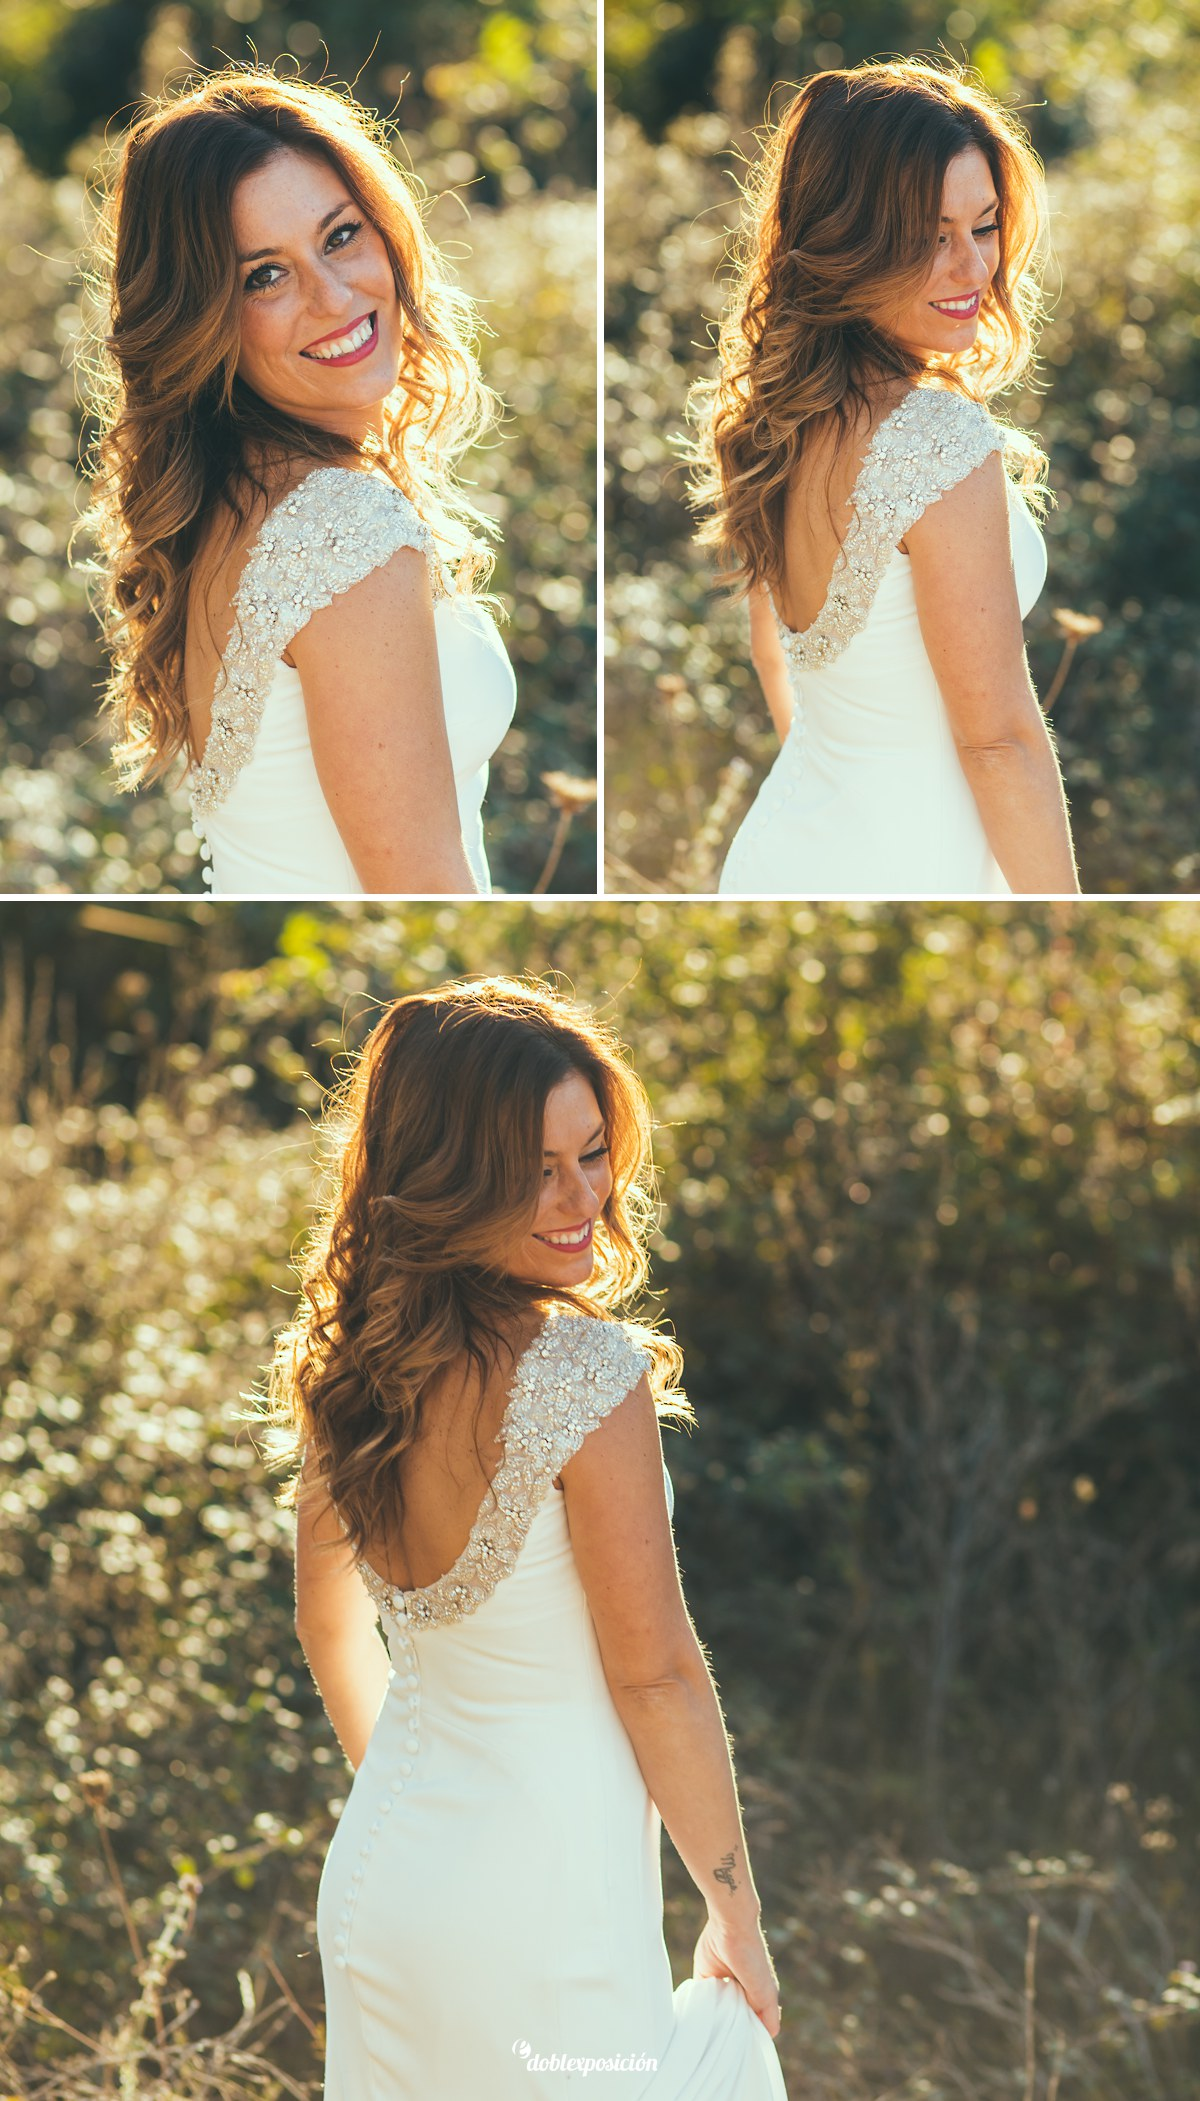 fotografos-boda-elche-alicante-reportaje-bosque-postboda-002